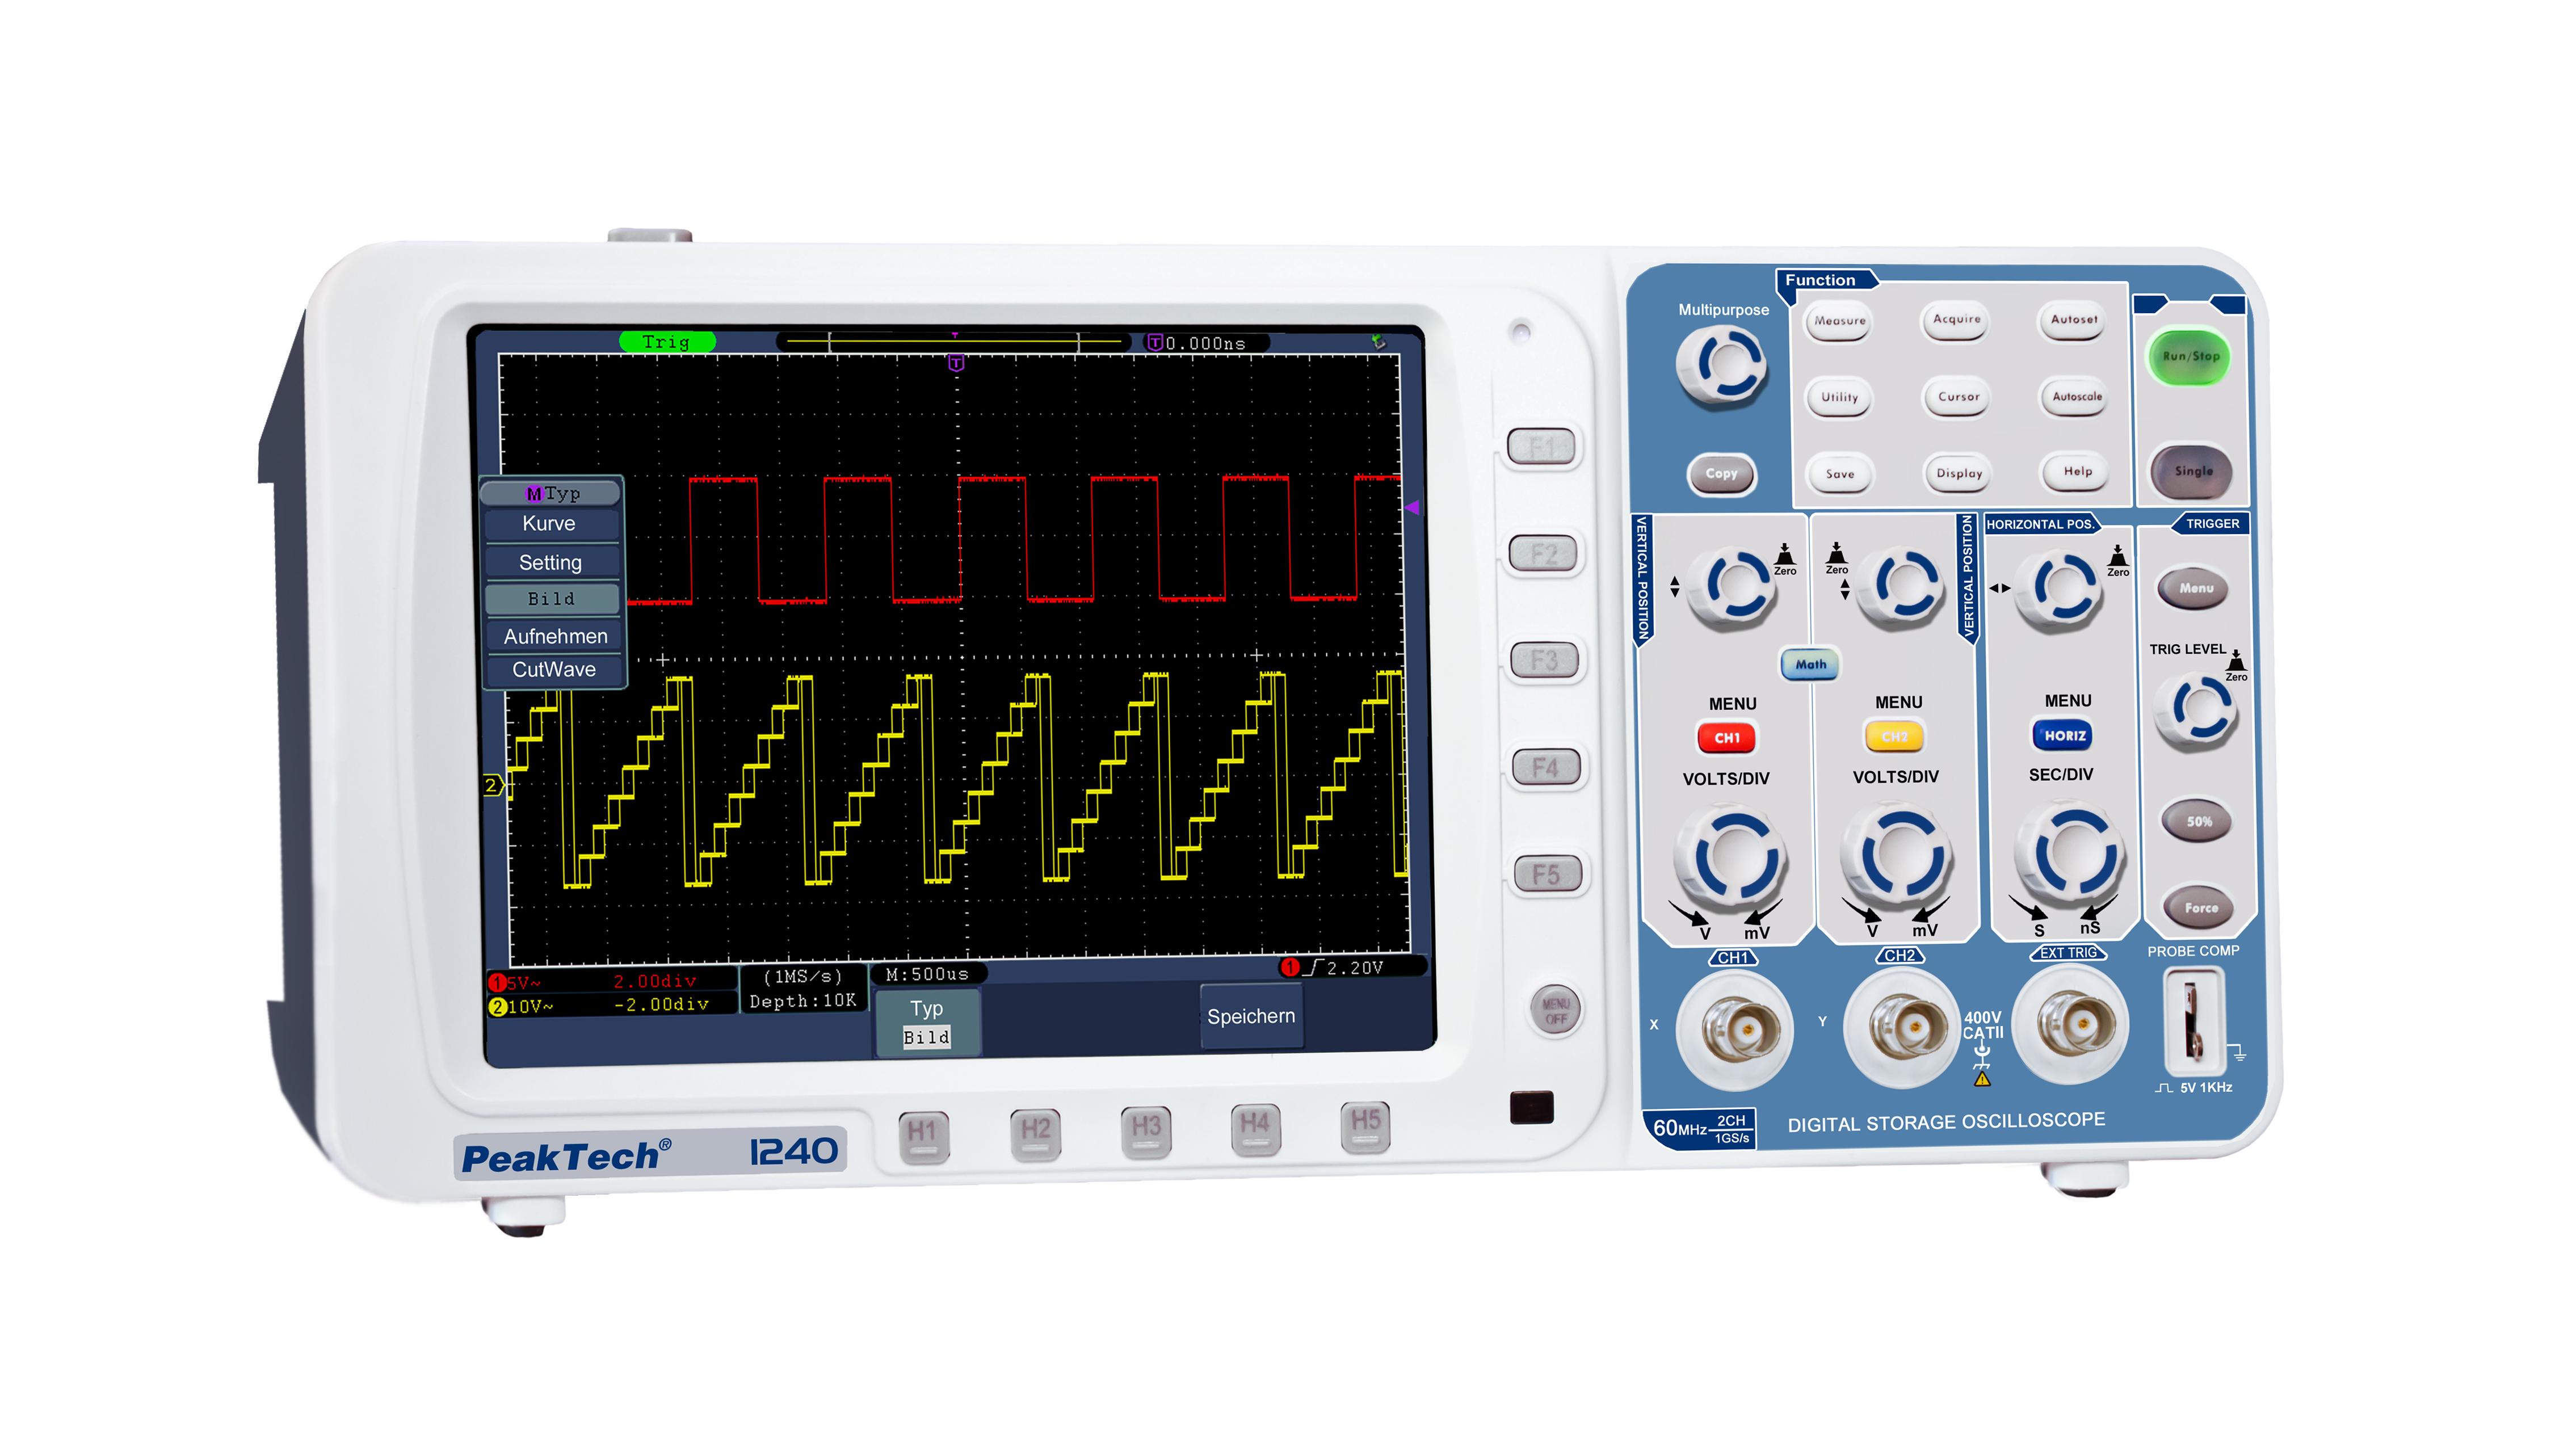 «PeakTech® P 1240» 60 MHz/2CH, 500MSa/s, Digital Storage Oscilloscope